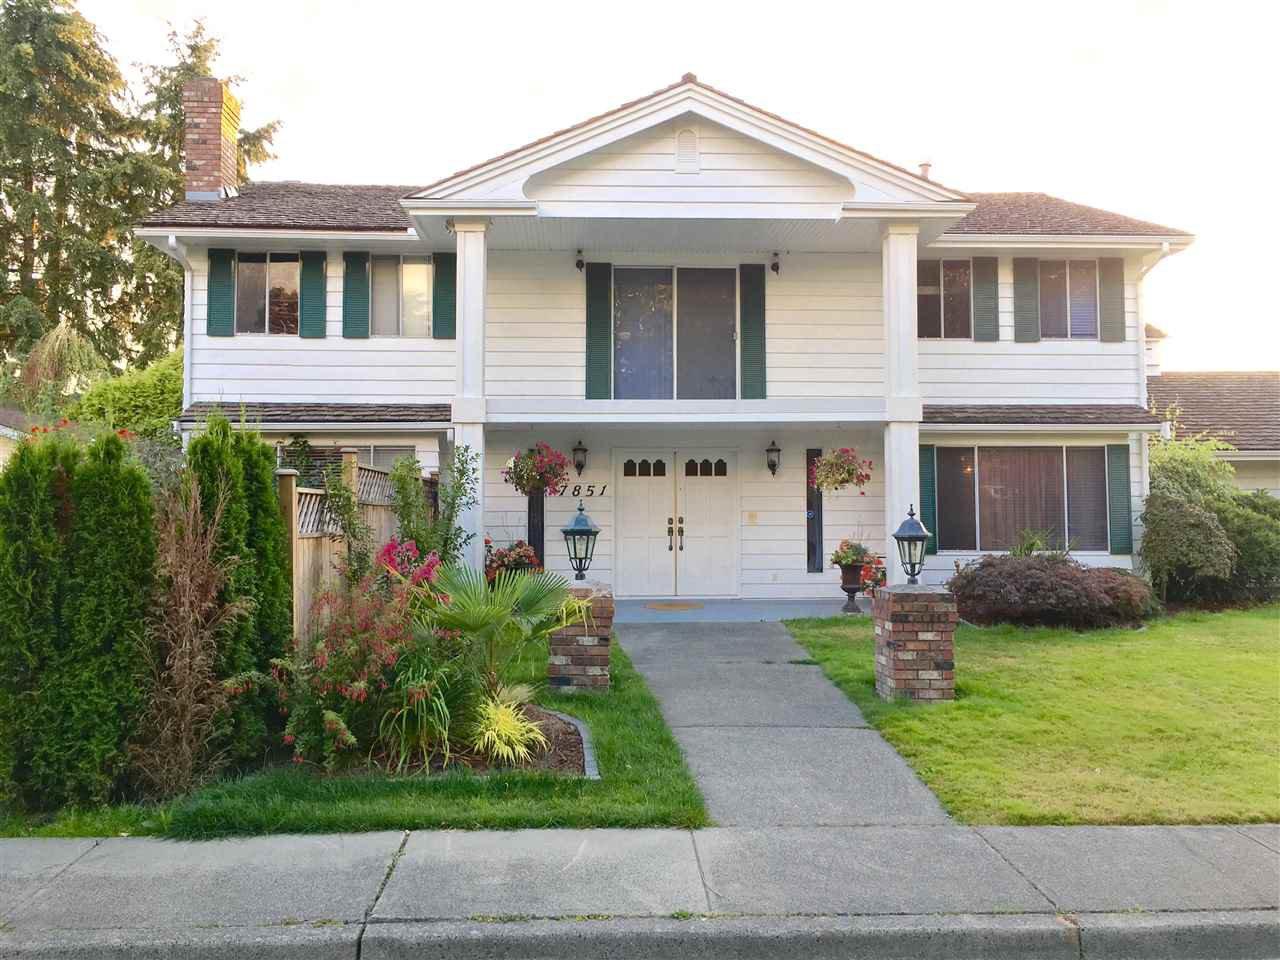 Main Photo: 7851 WATERTON Drive in Richmond: Broadmoor House for sale : MLS®# R2097641